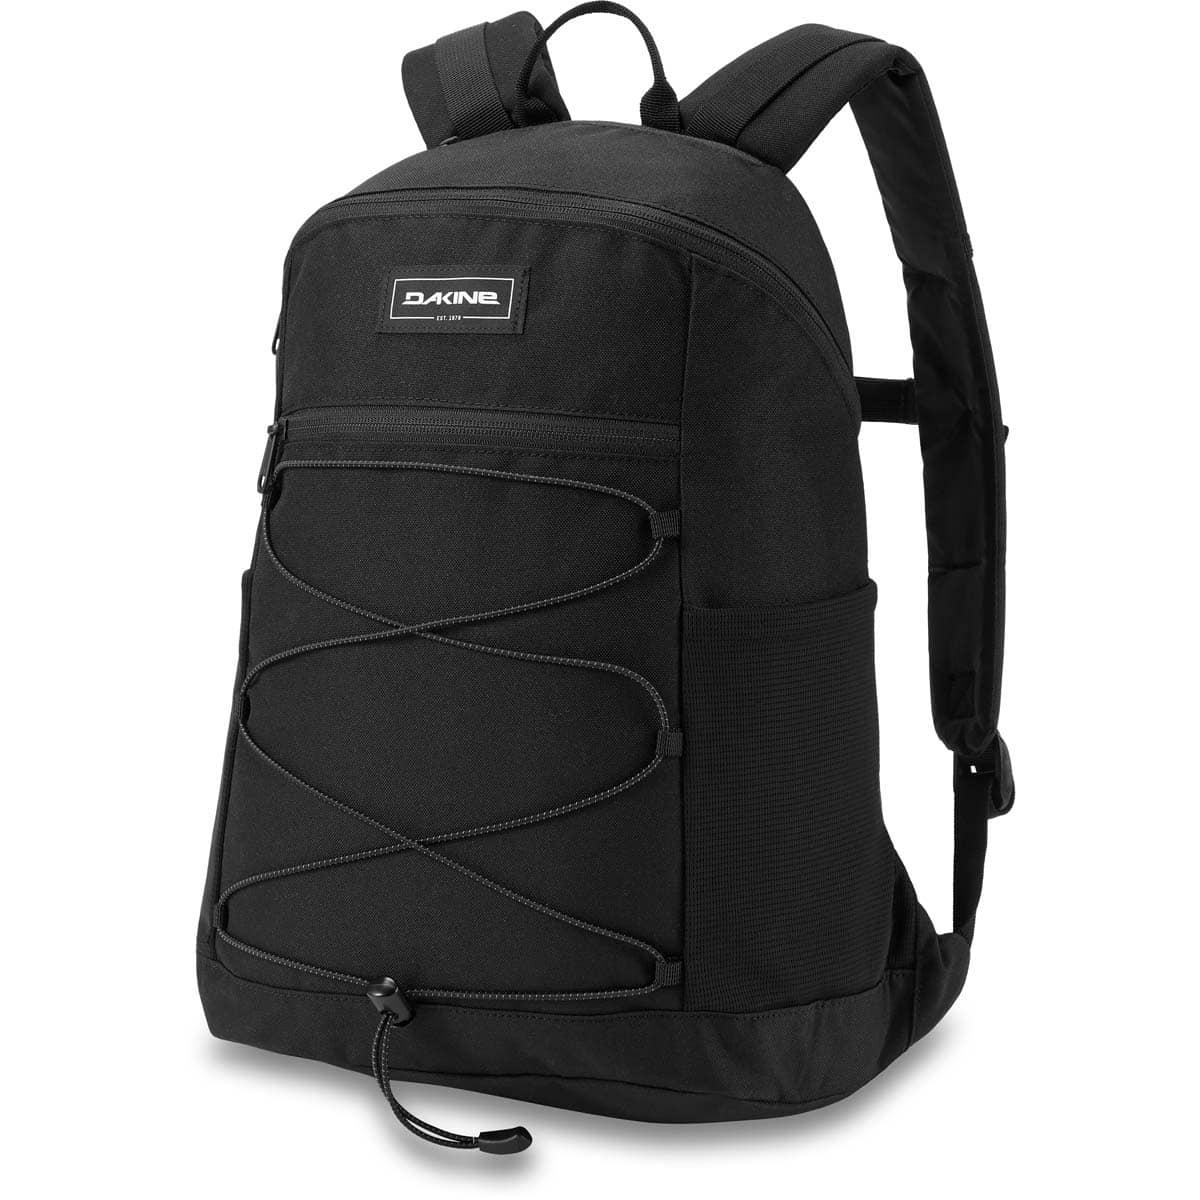 18L Dakine Unisex Wndr Backpack